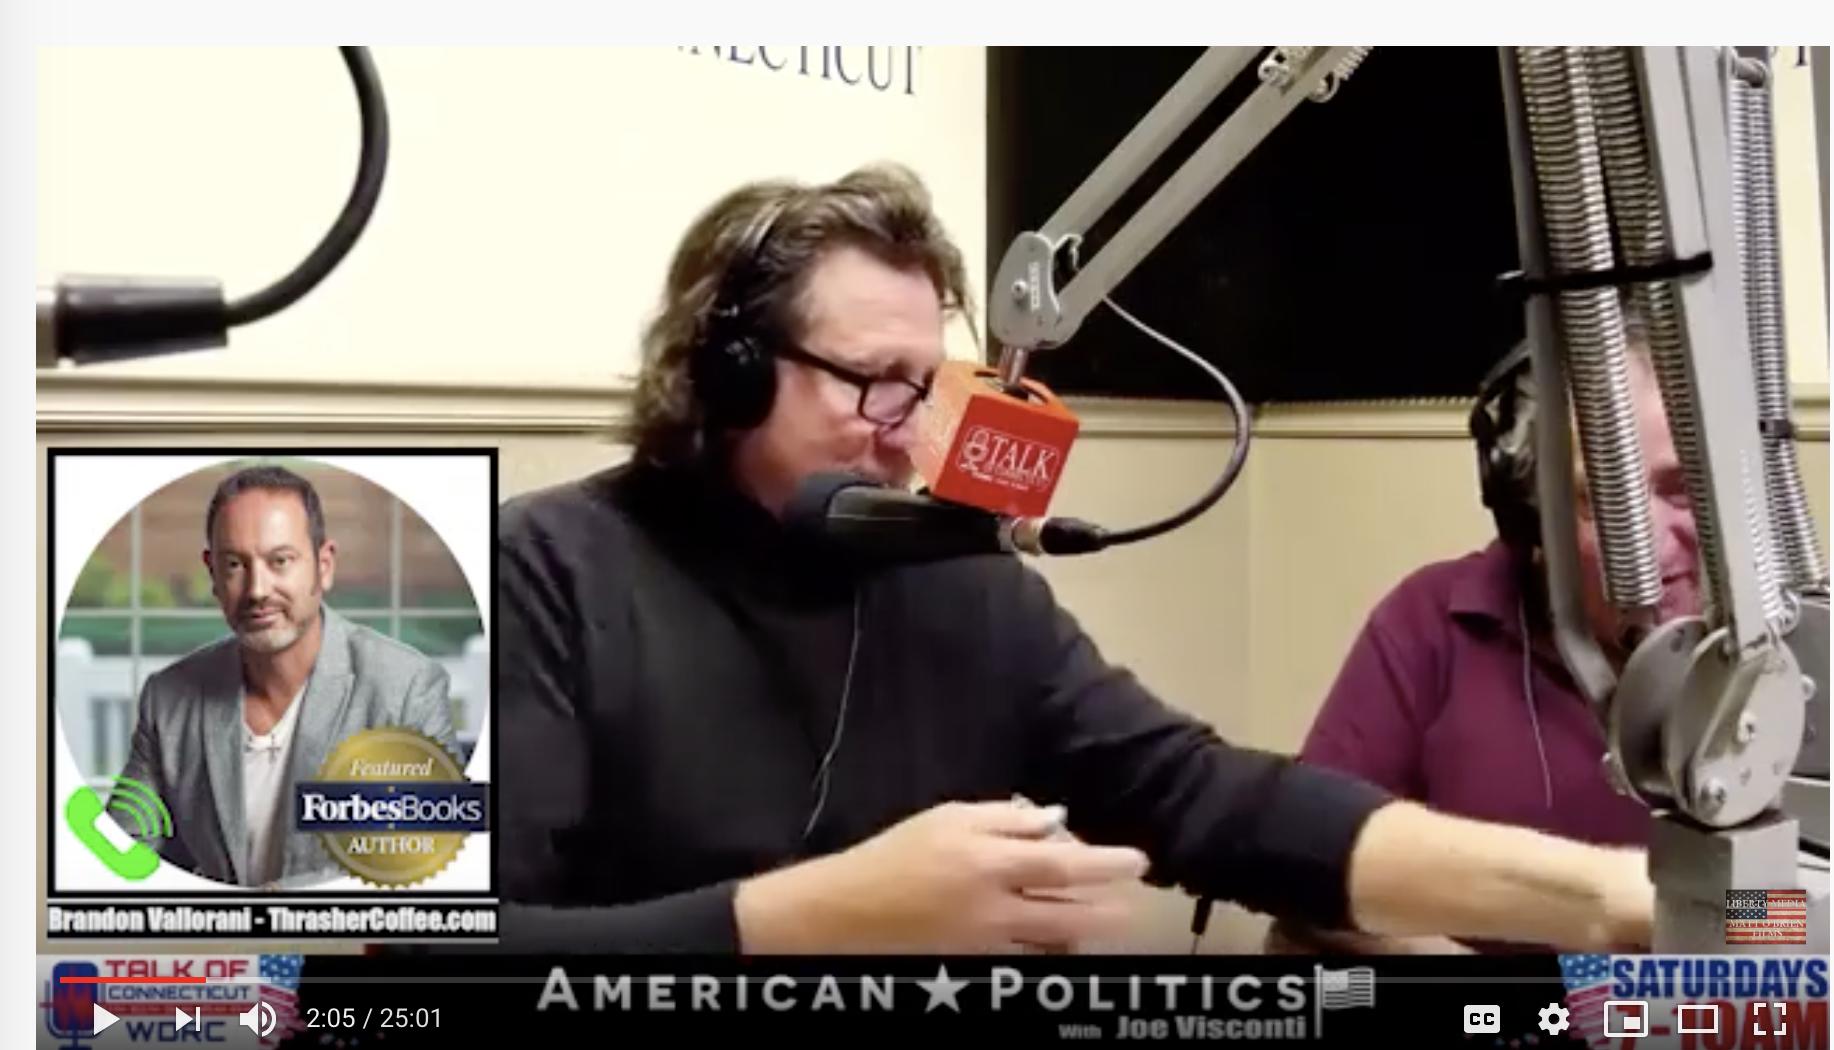 American Politics with Joe Visconti and Seth Rosenblit